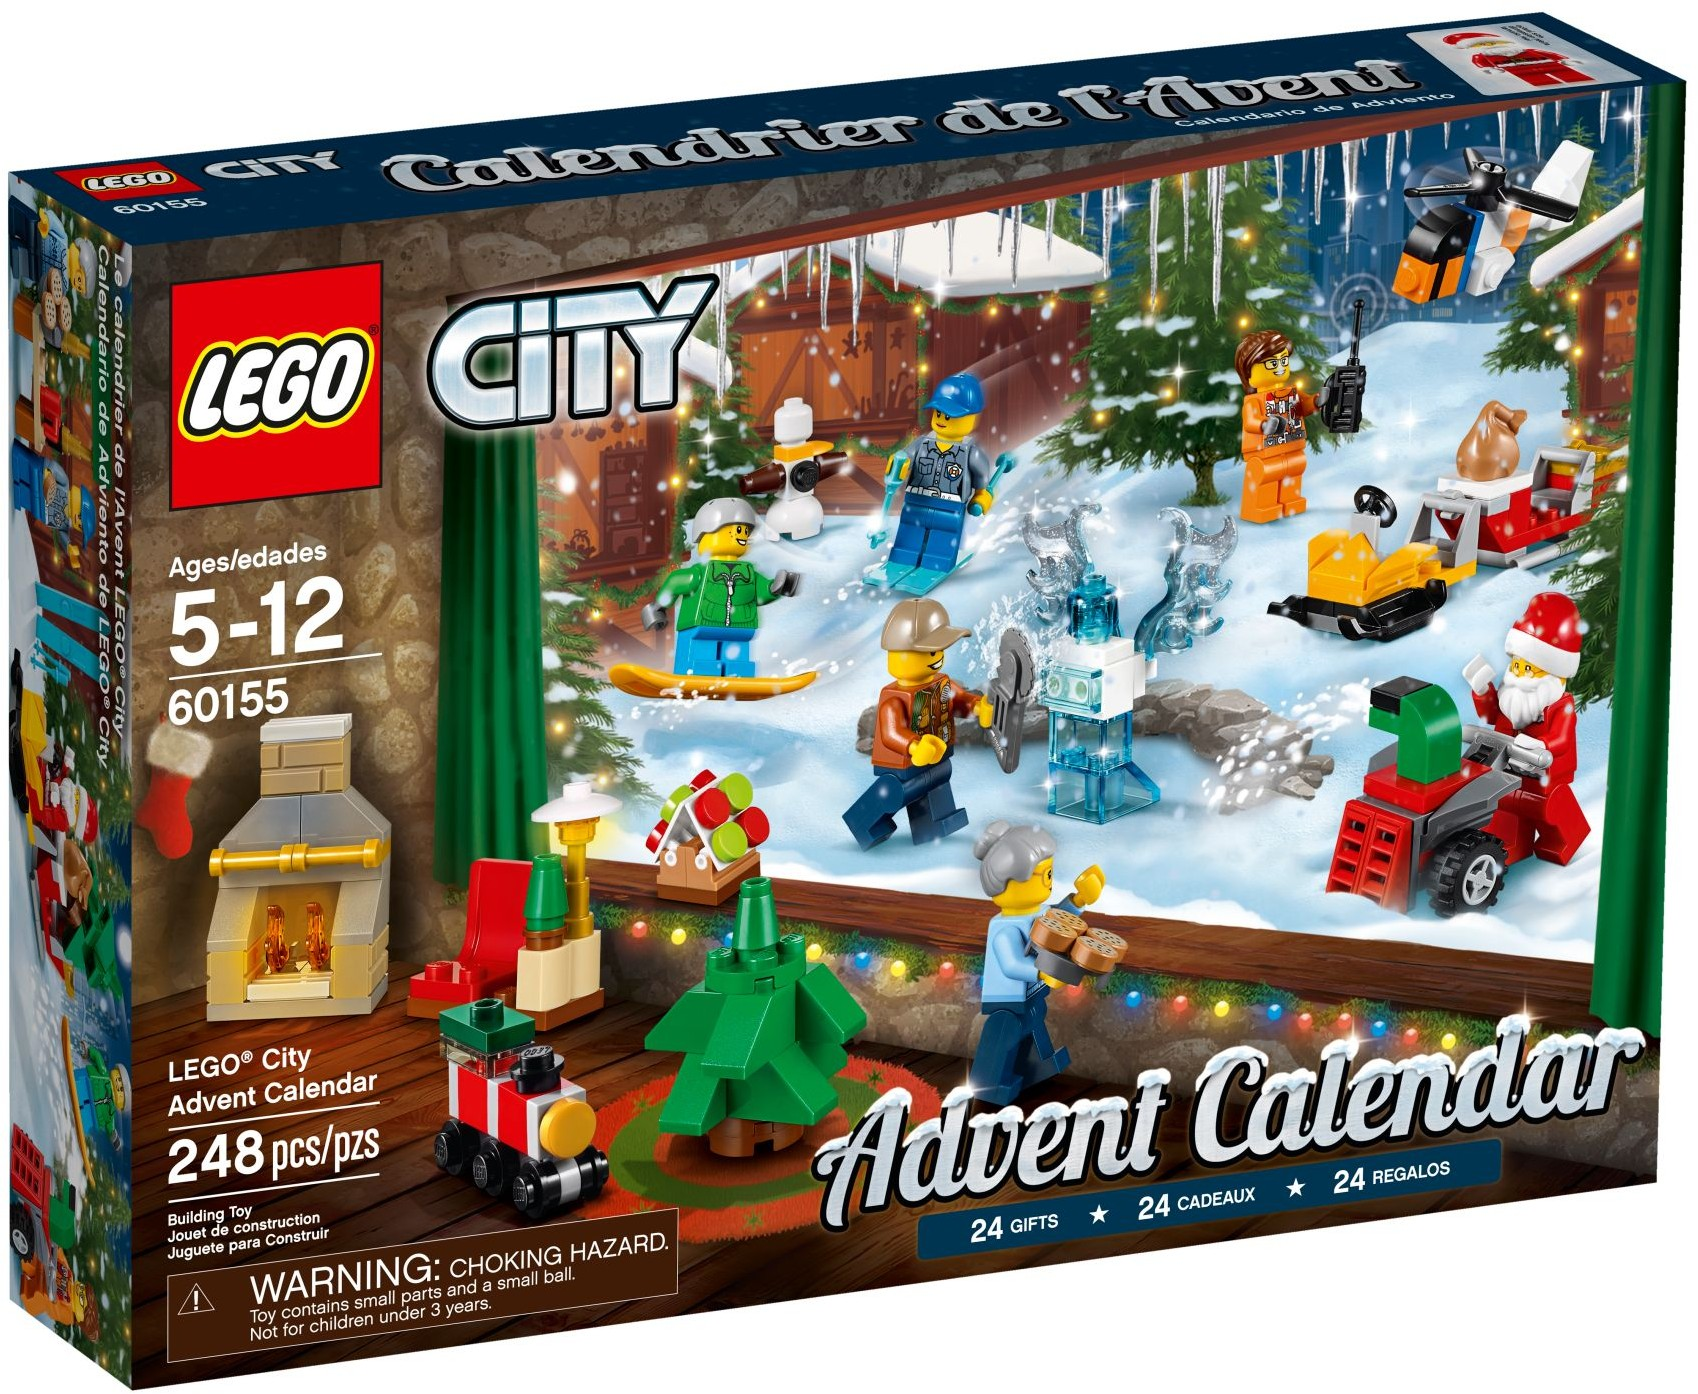 adventni kalendar lego SUPERLega.cz   obchod se super kostkami lega. LEGO City 60155  adventni kalendar lego